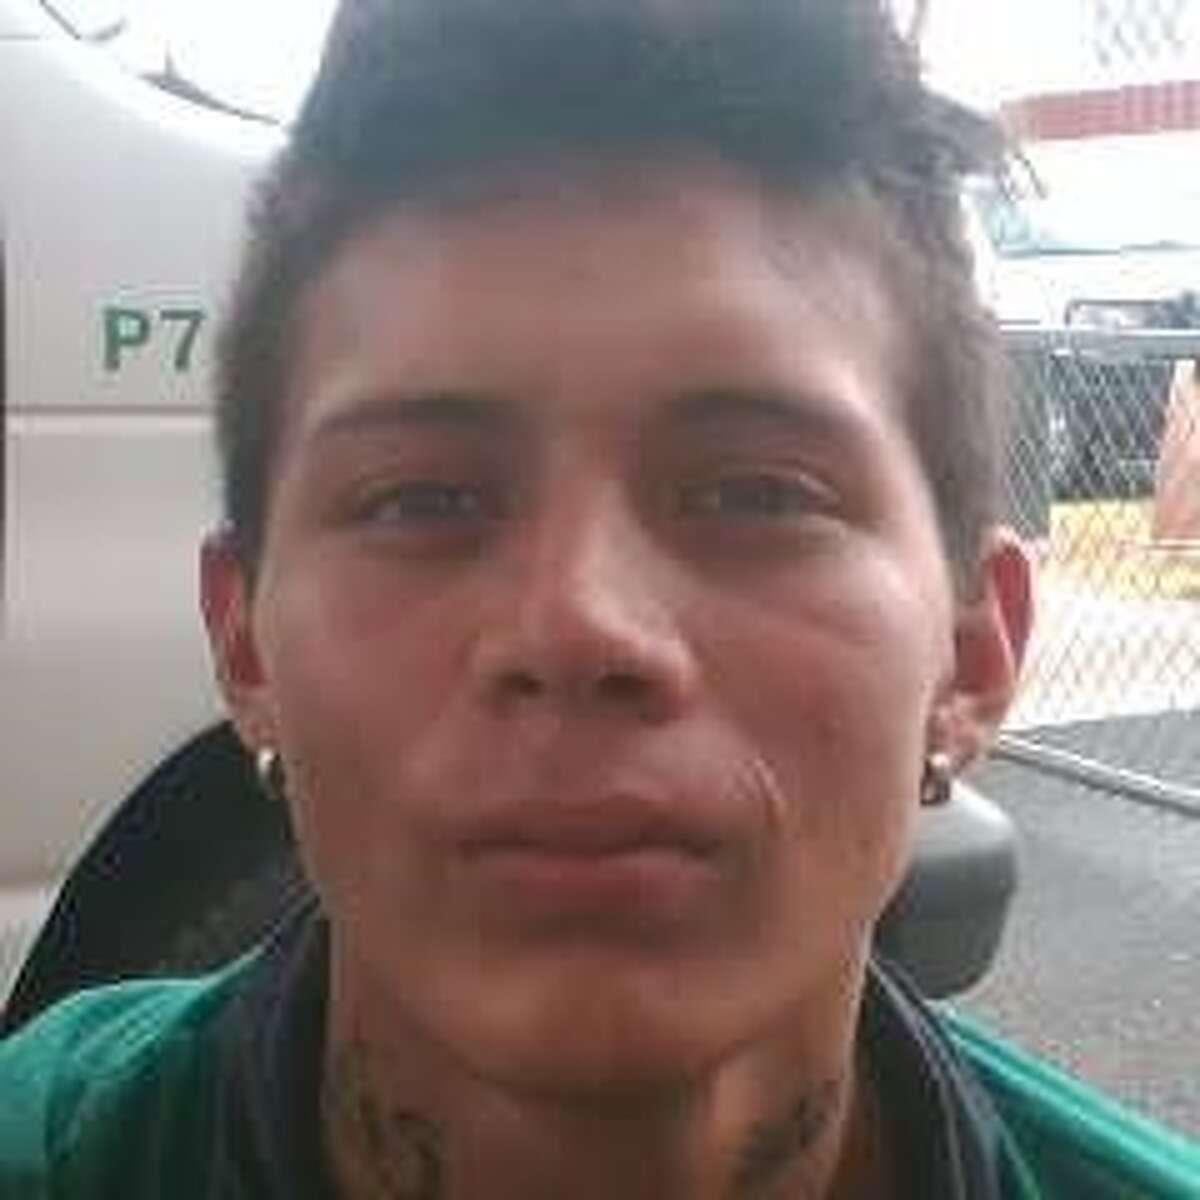 Luis Fernando Ramirez, a 20-year old Honduran citizen, crossed the border illegally.